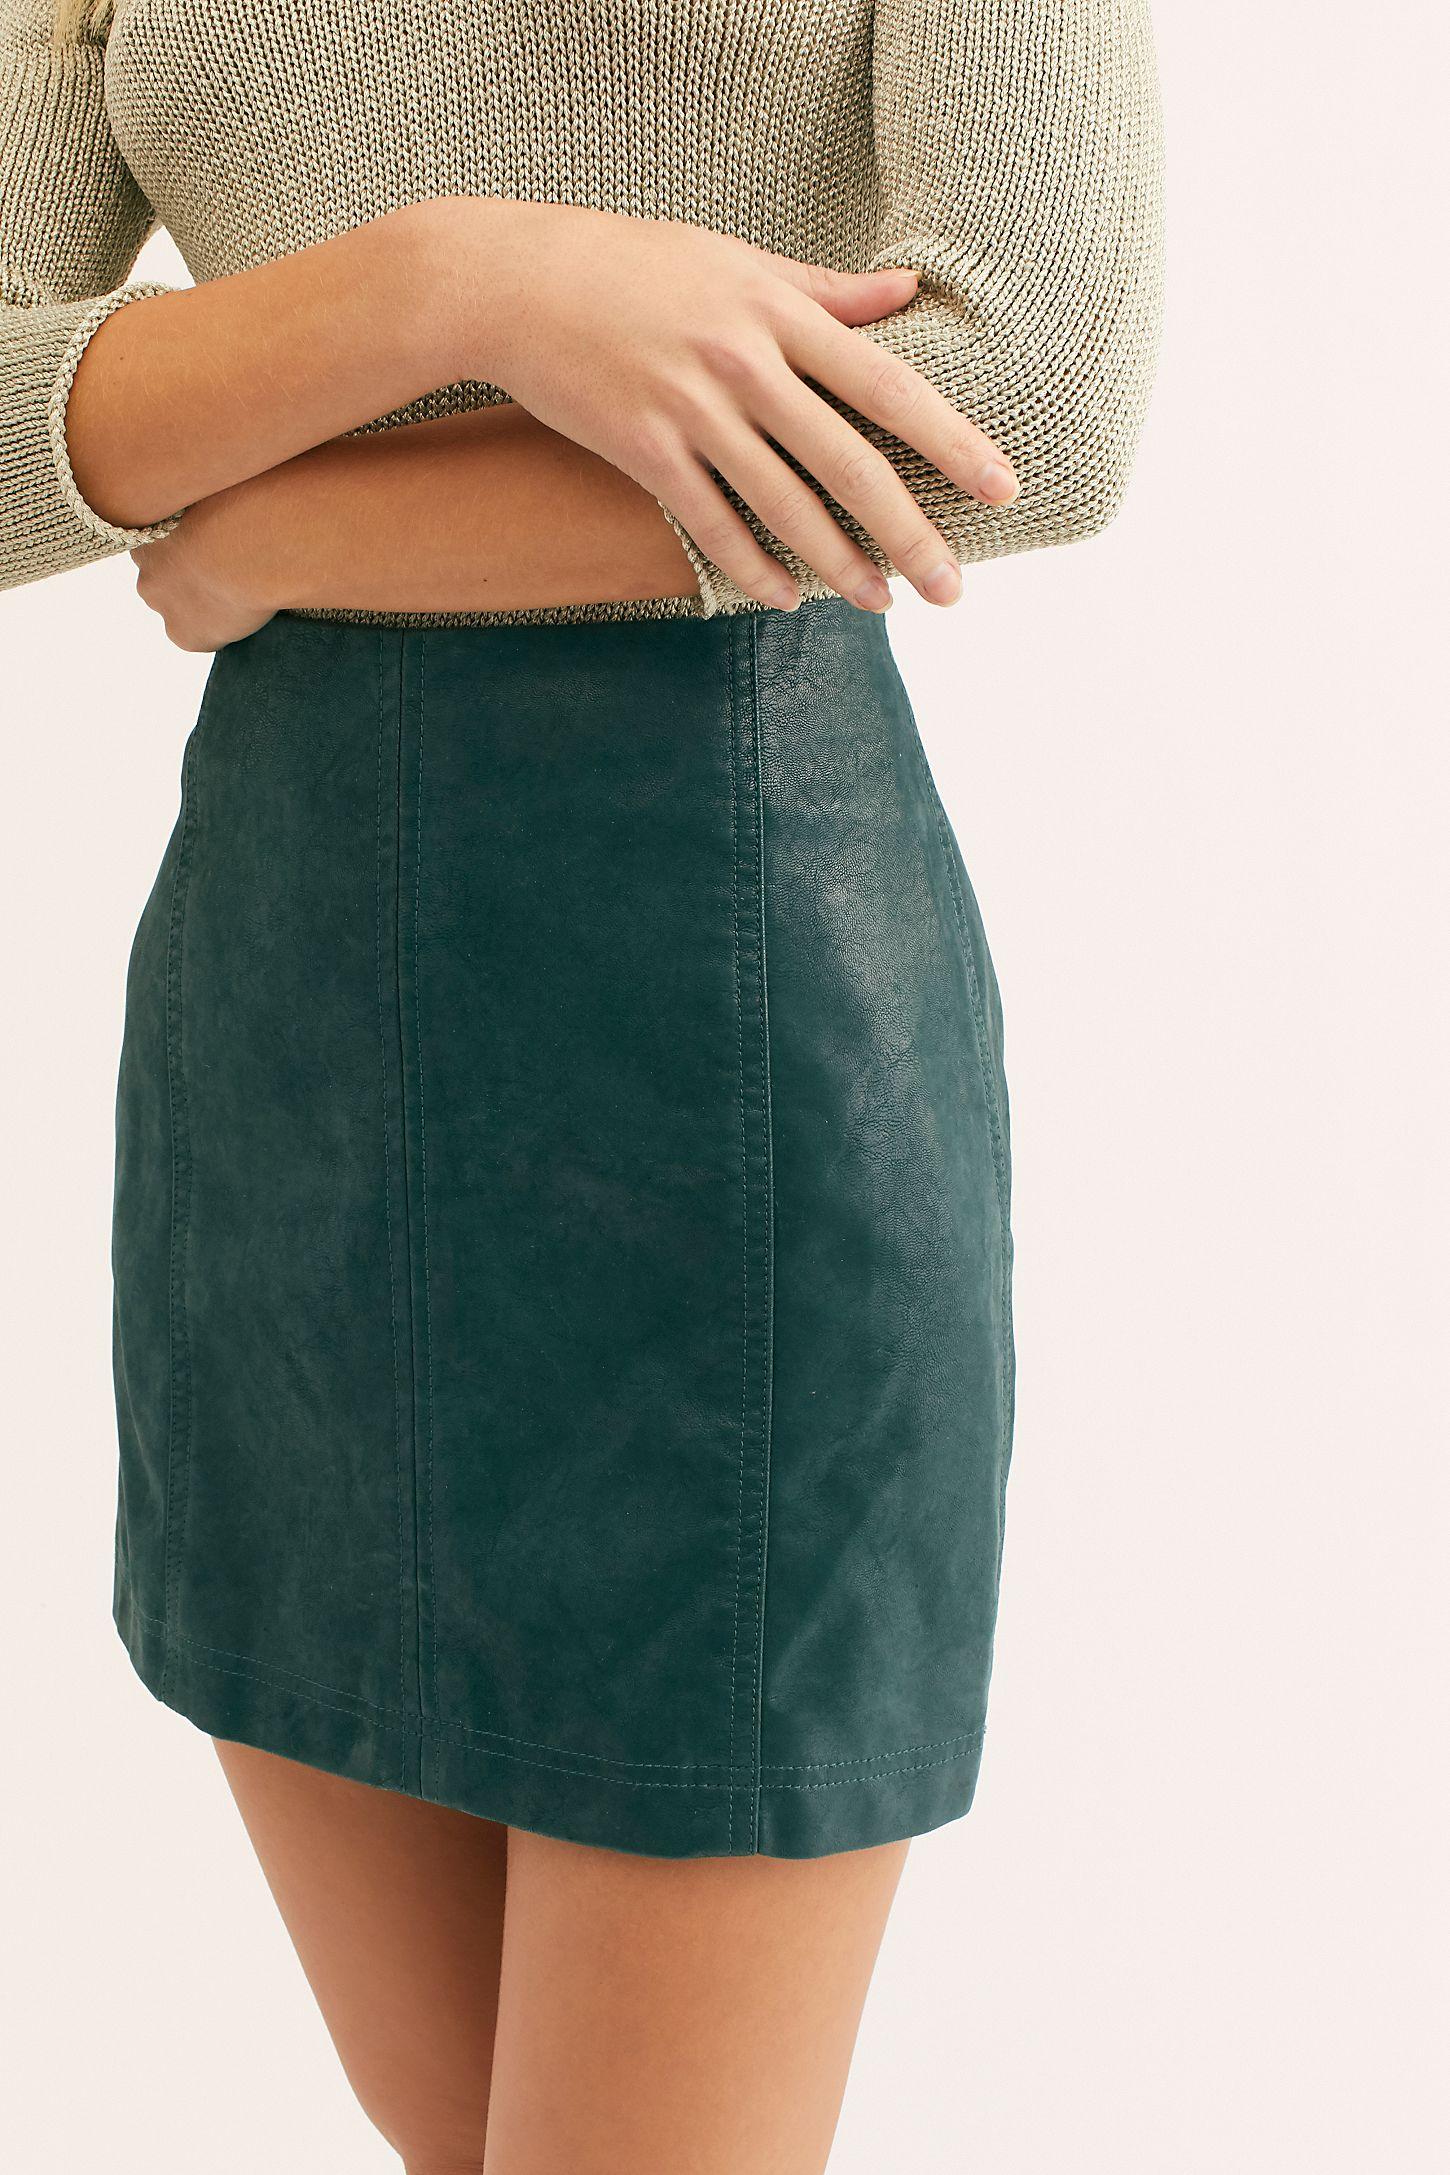 6baaa98337 Slide View 3: Modern Femme Vegan Suede Mini Skirt